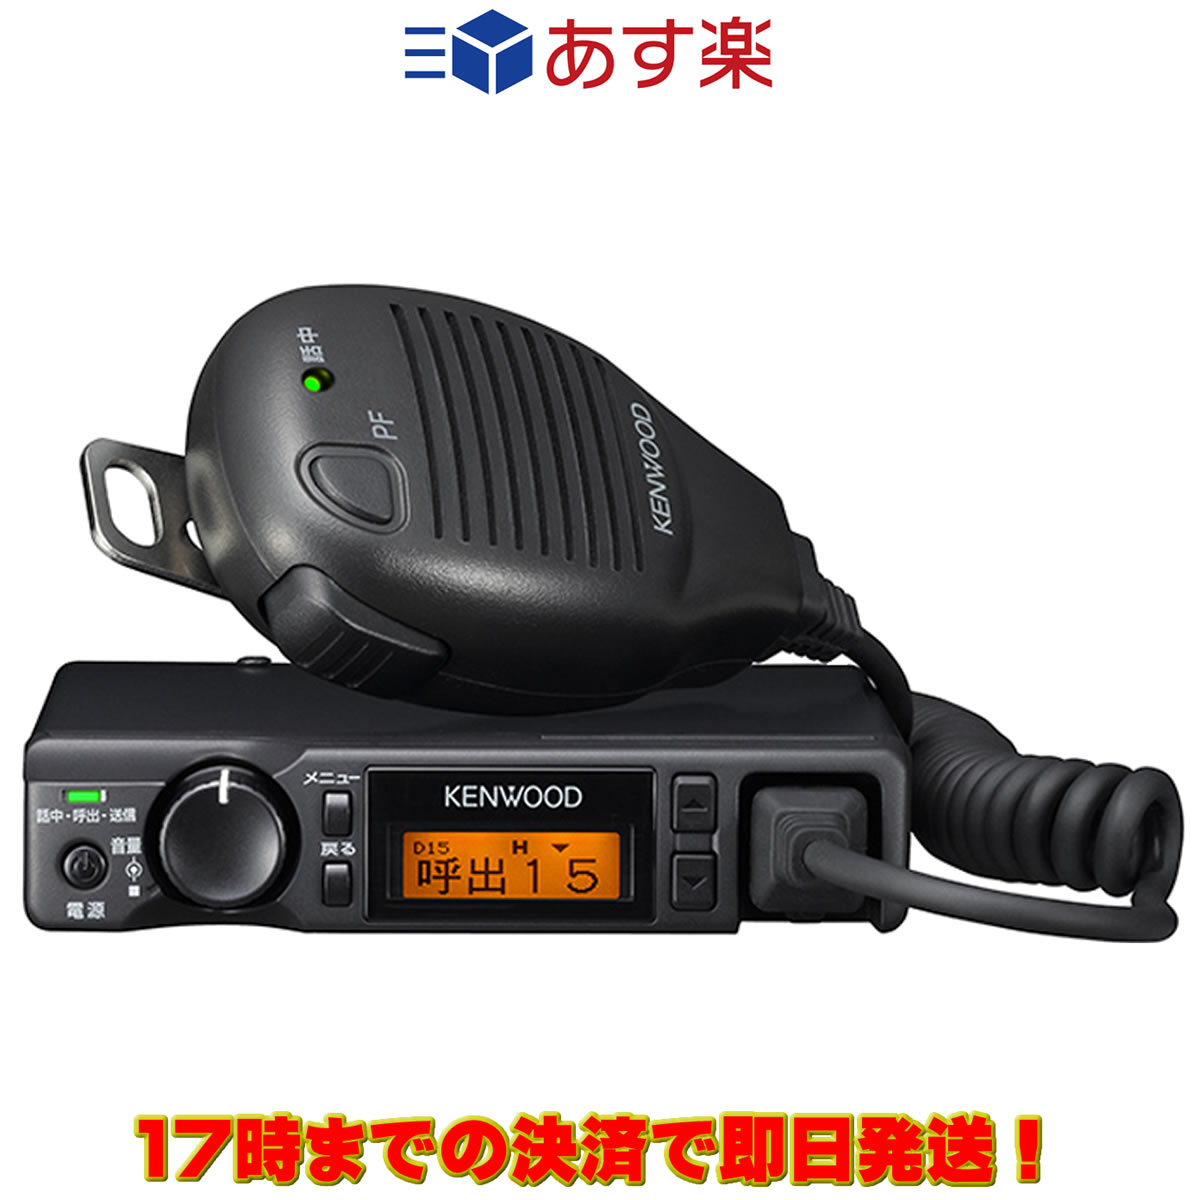 TMZ-D504 ケンウッド デジタル簡易無線電話装置 351MHz帯 30ch 登録局